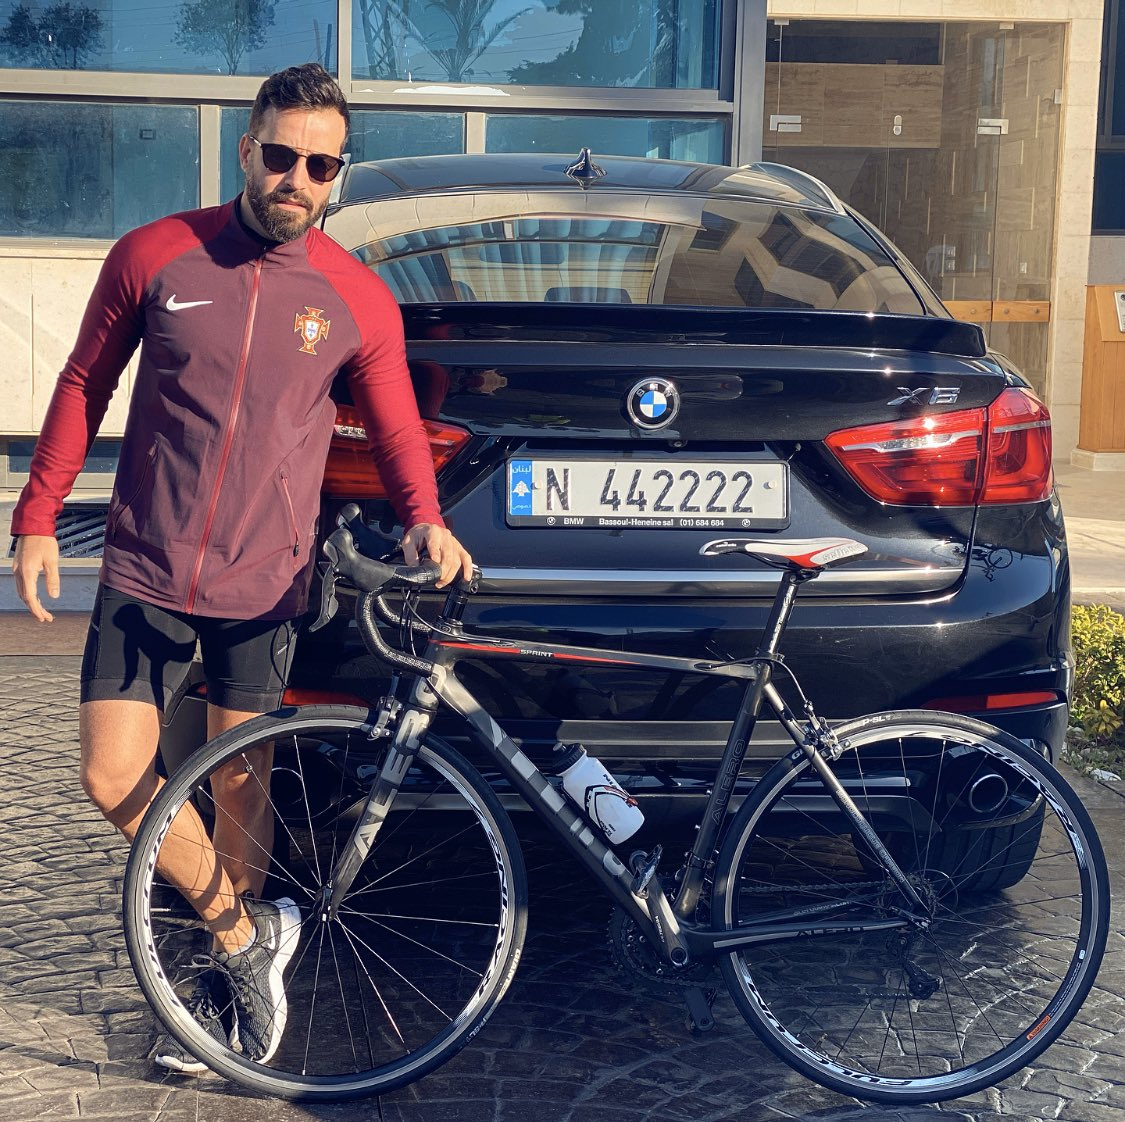 Saad Ramadan On Twitter I Don T Ride My Bike To Win Races Nor Do